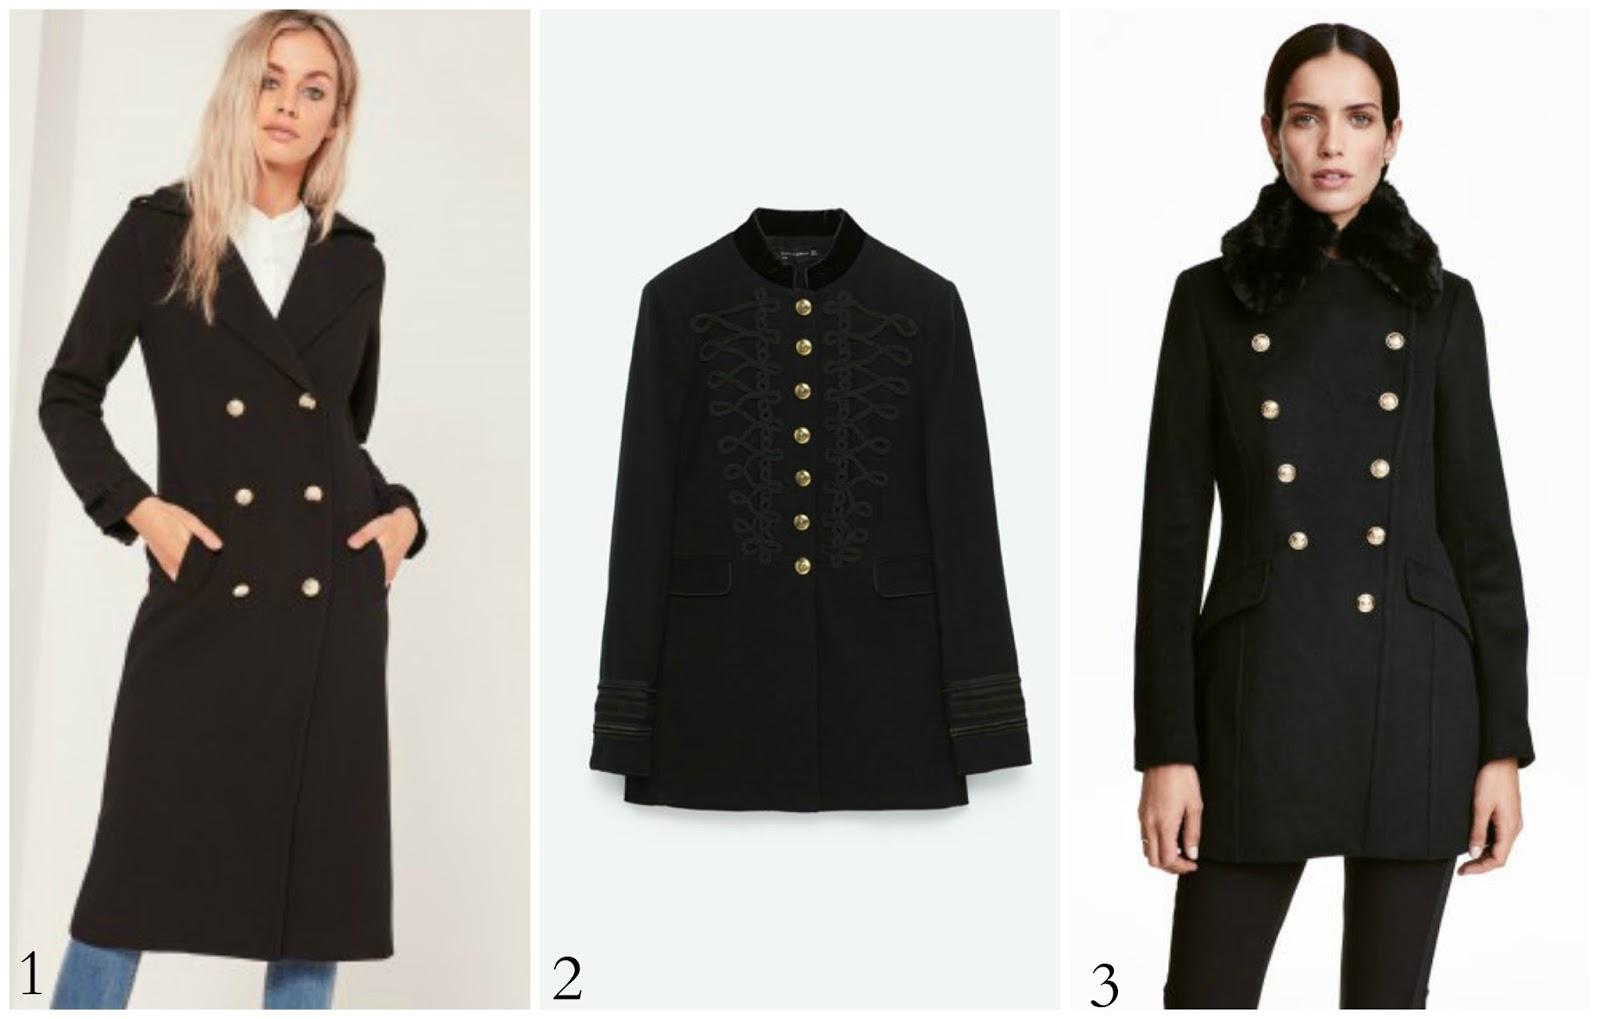 21 Winter Coats That Won't Break The Bank - 3